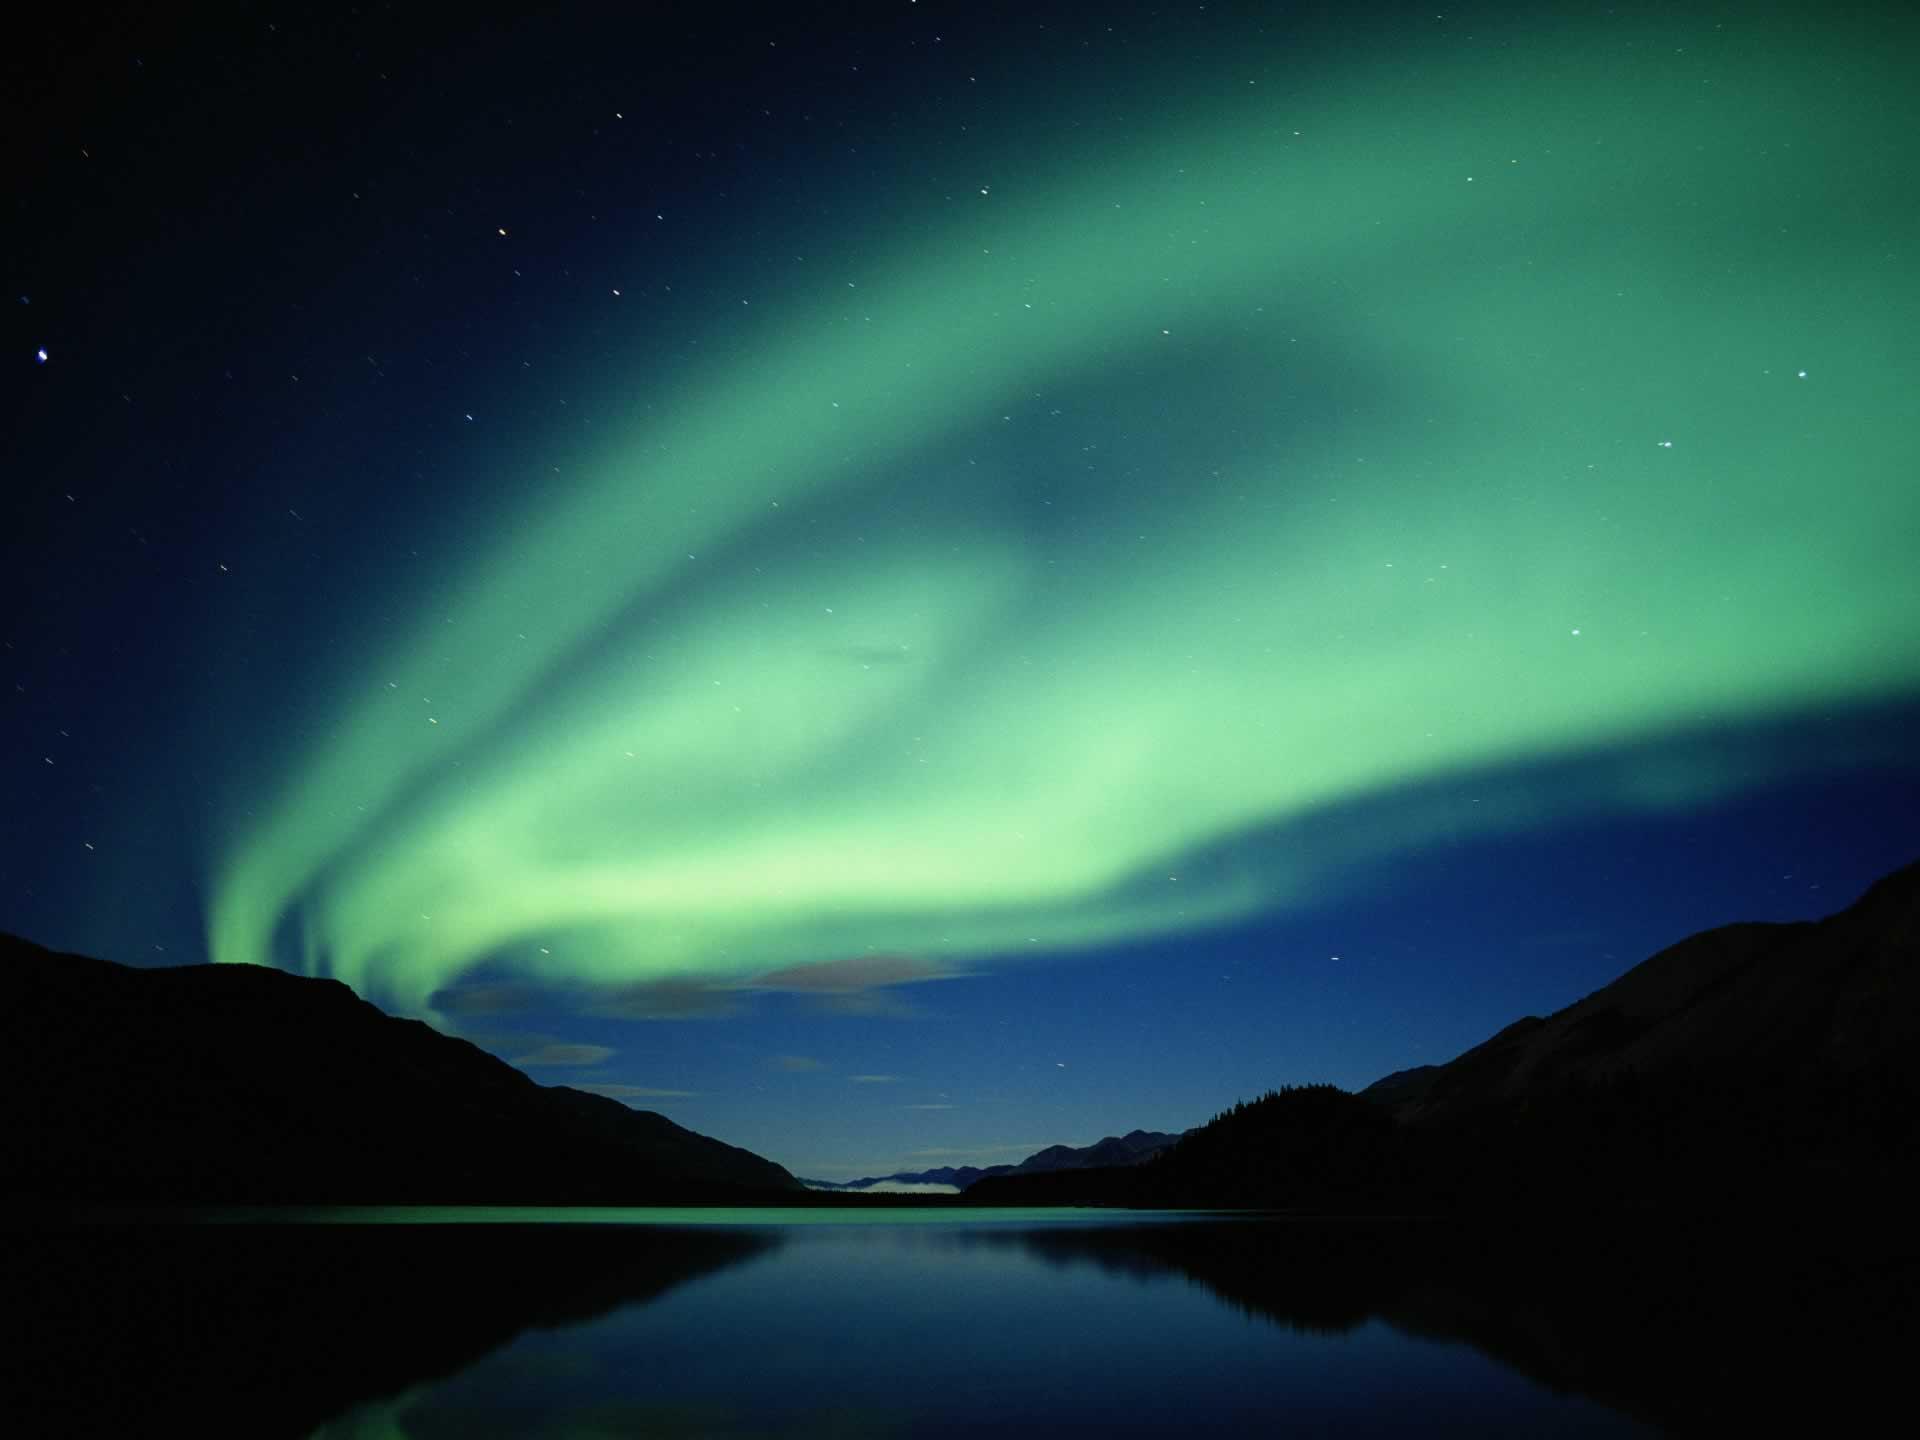 northern lights images 21162